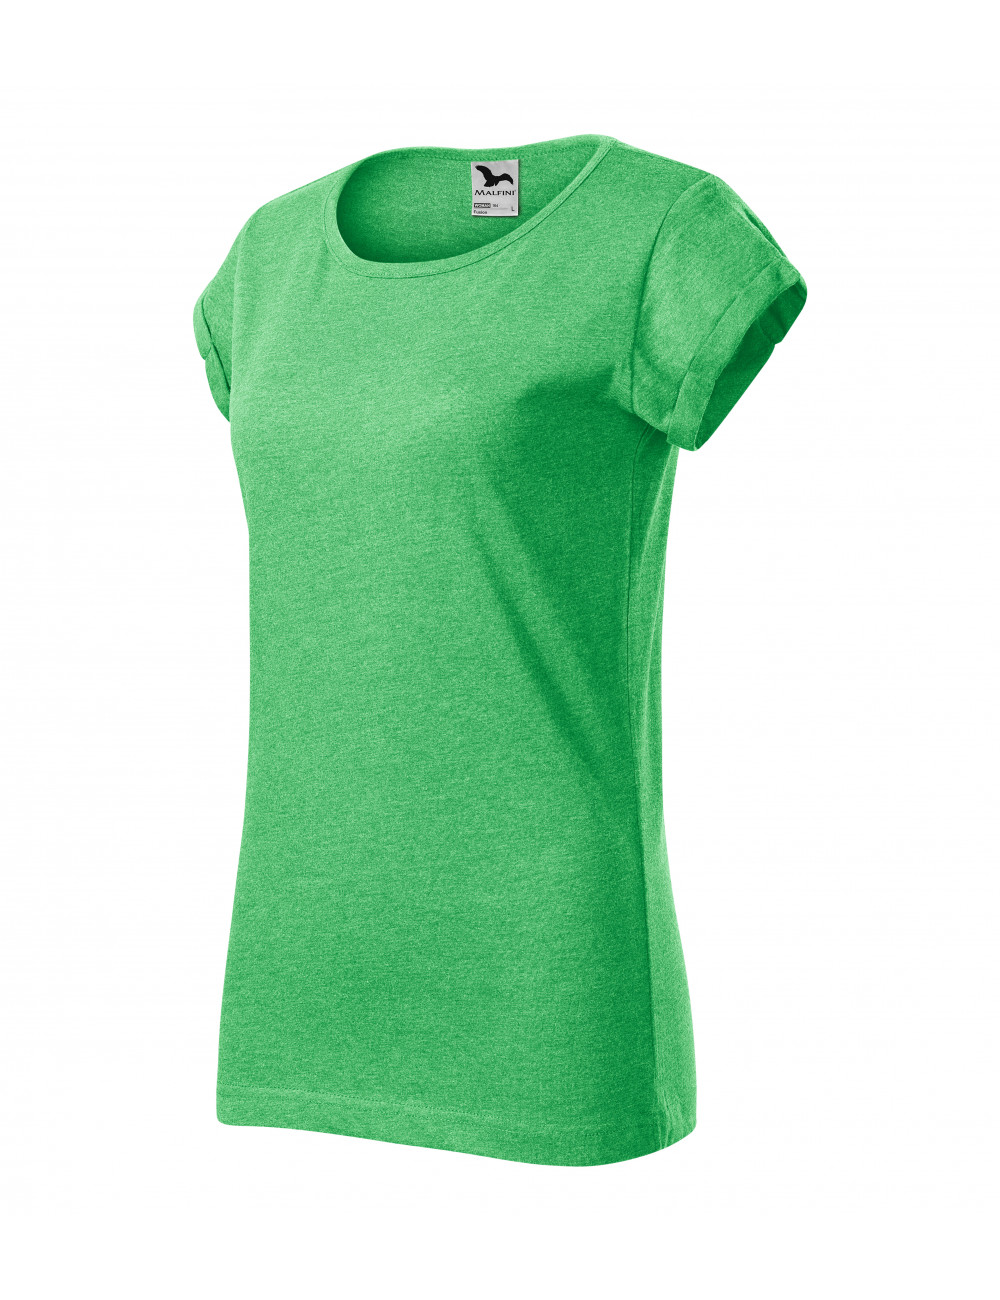 Adler MALFINI Koszulka damska Fusion 164 zielony melanż